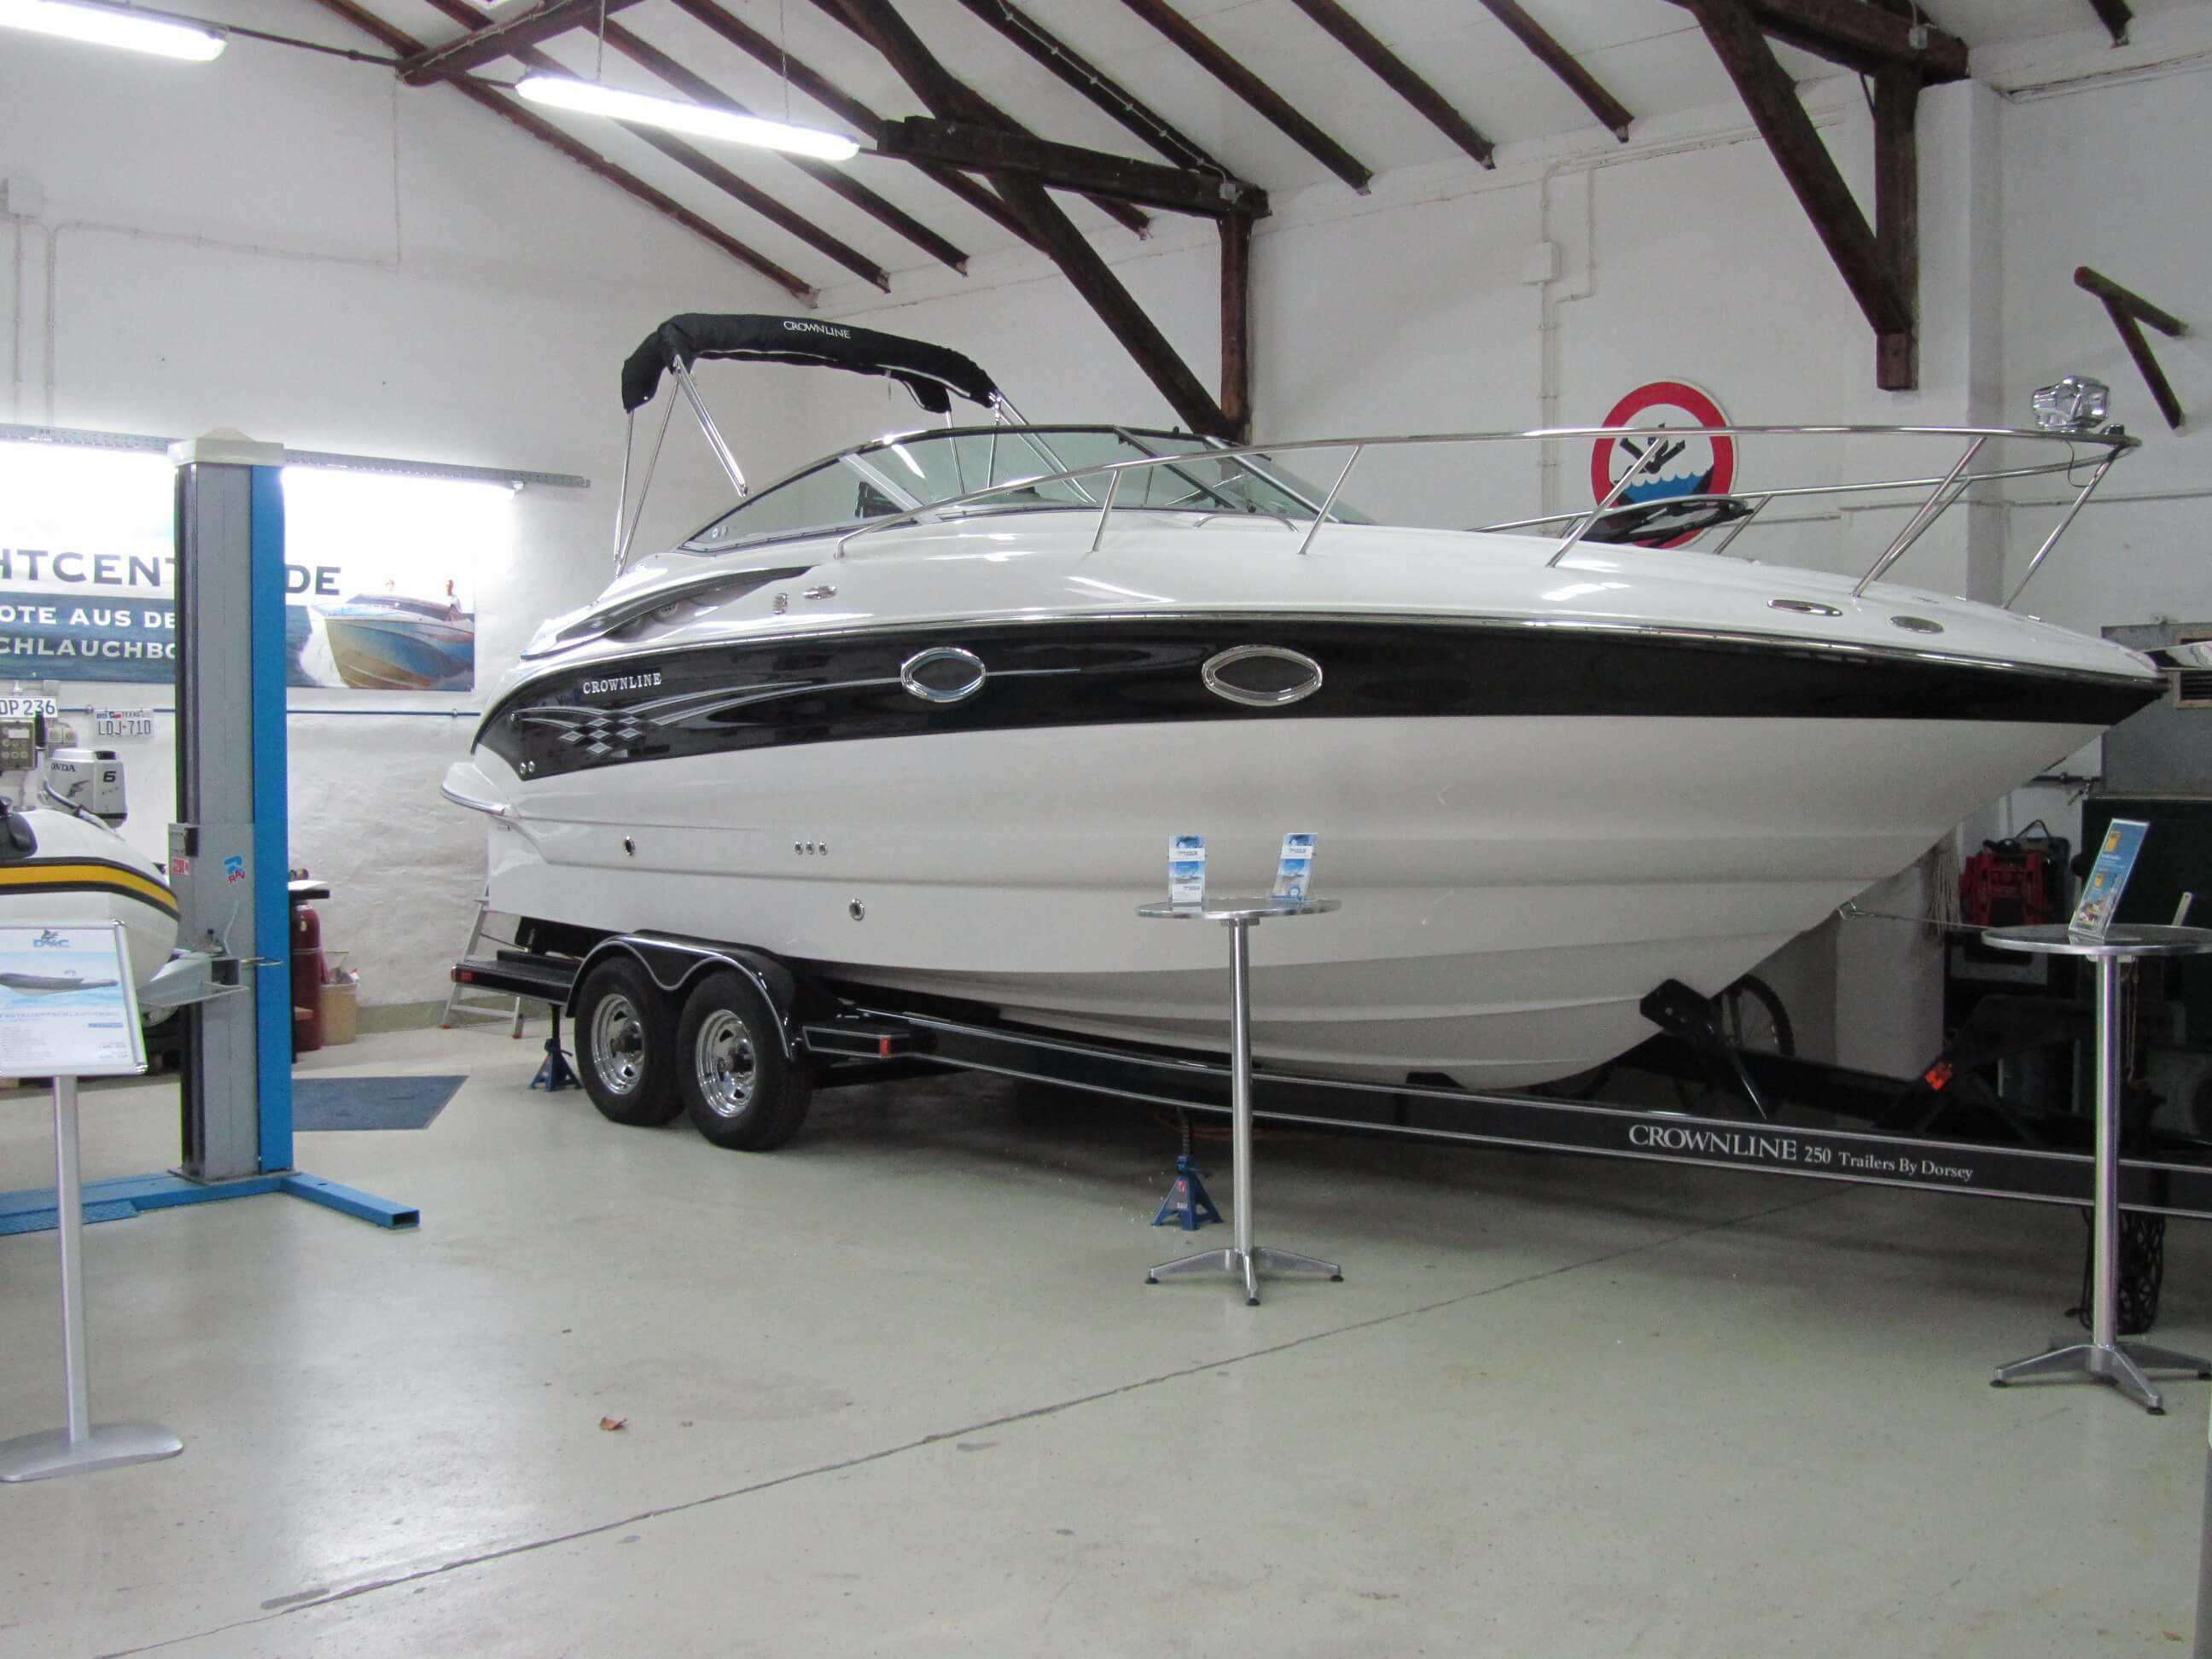 das-yachtcenter-iserlohn-0041-1